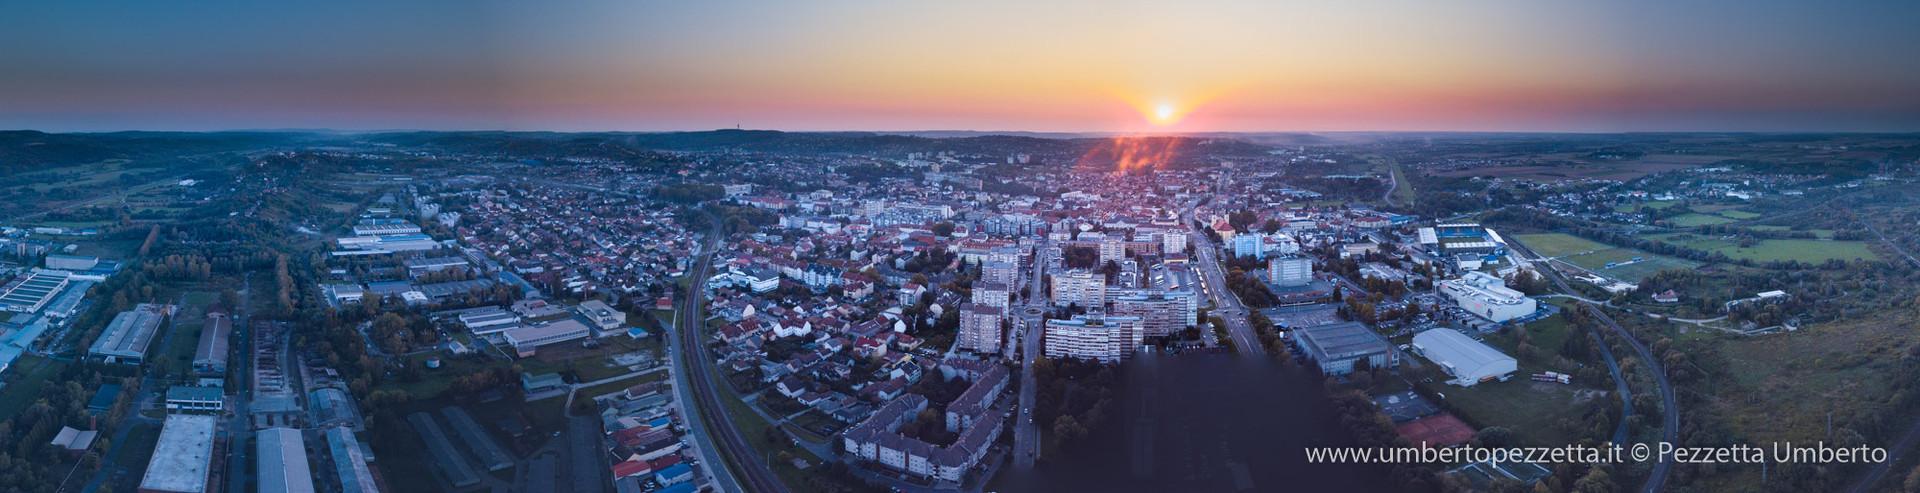 Zalaegerszeg from East